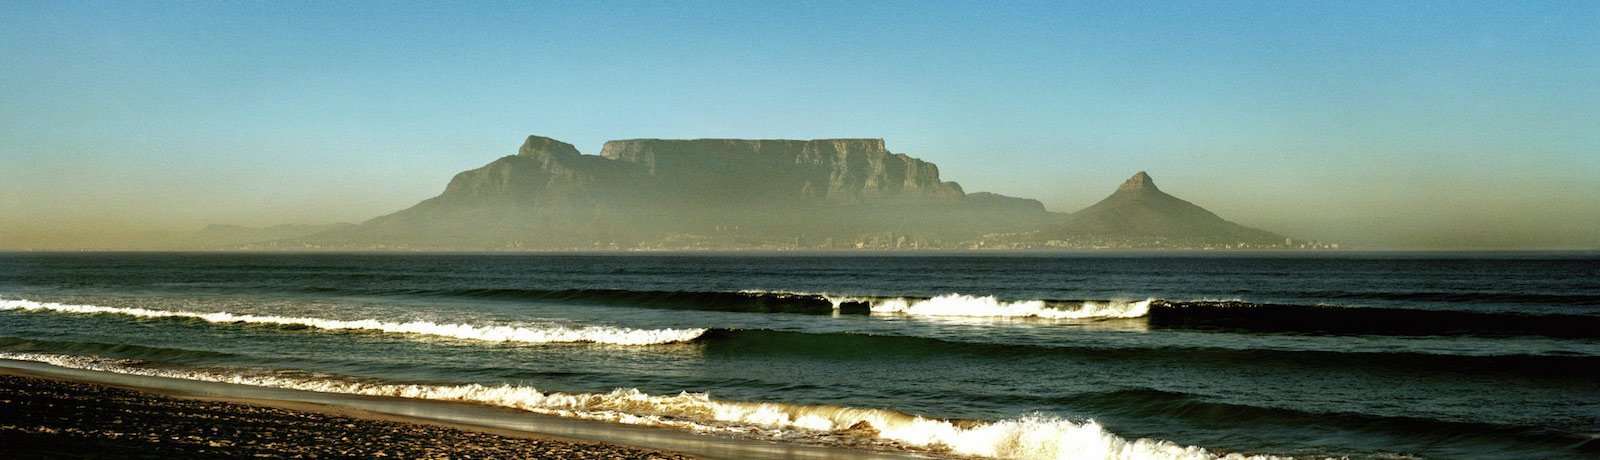 Motivational Speaker in Cape Town